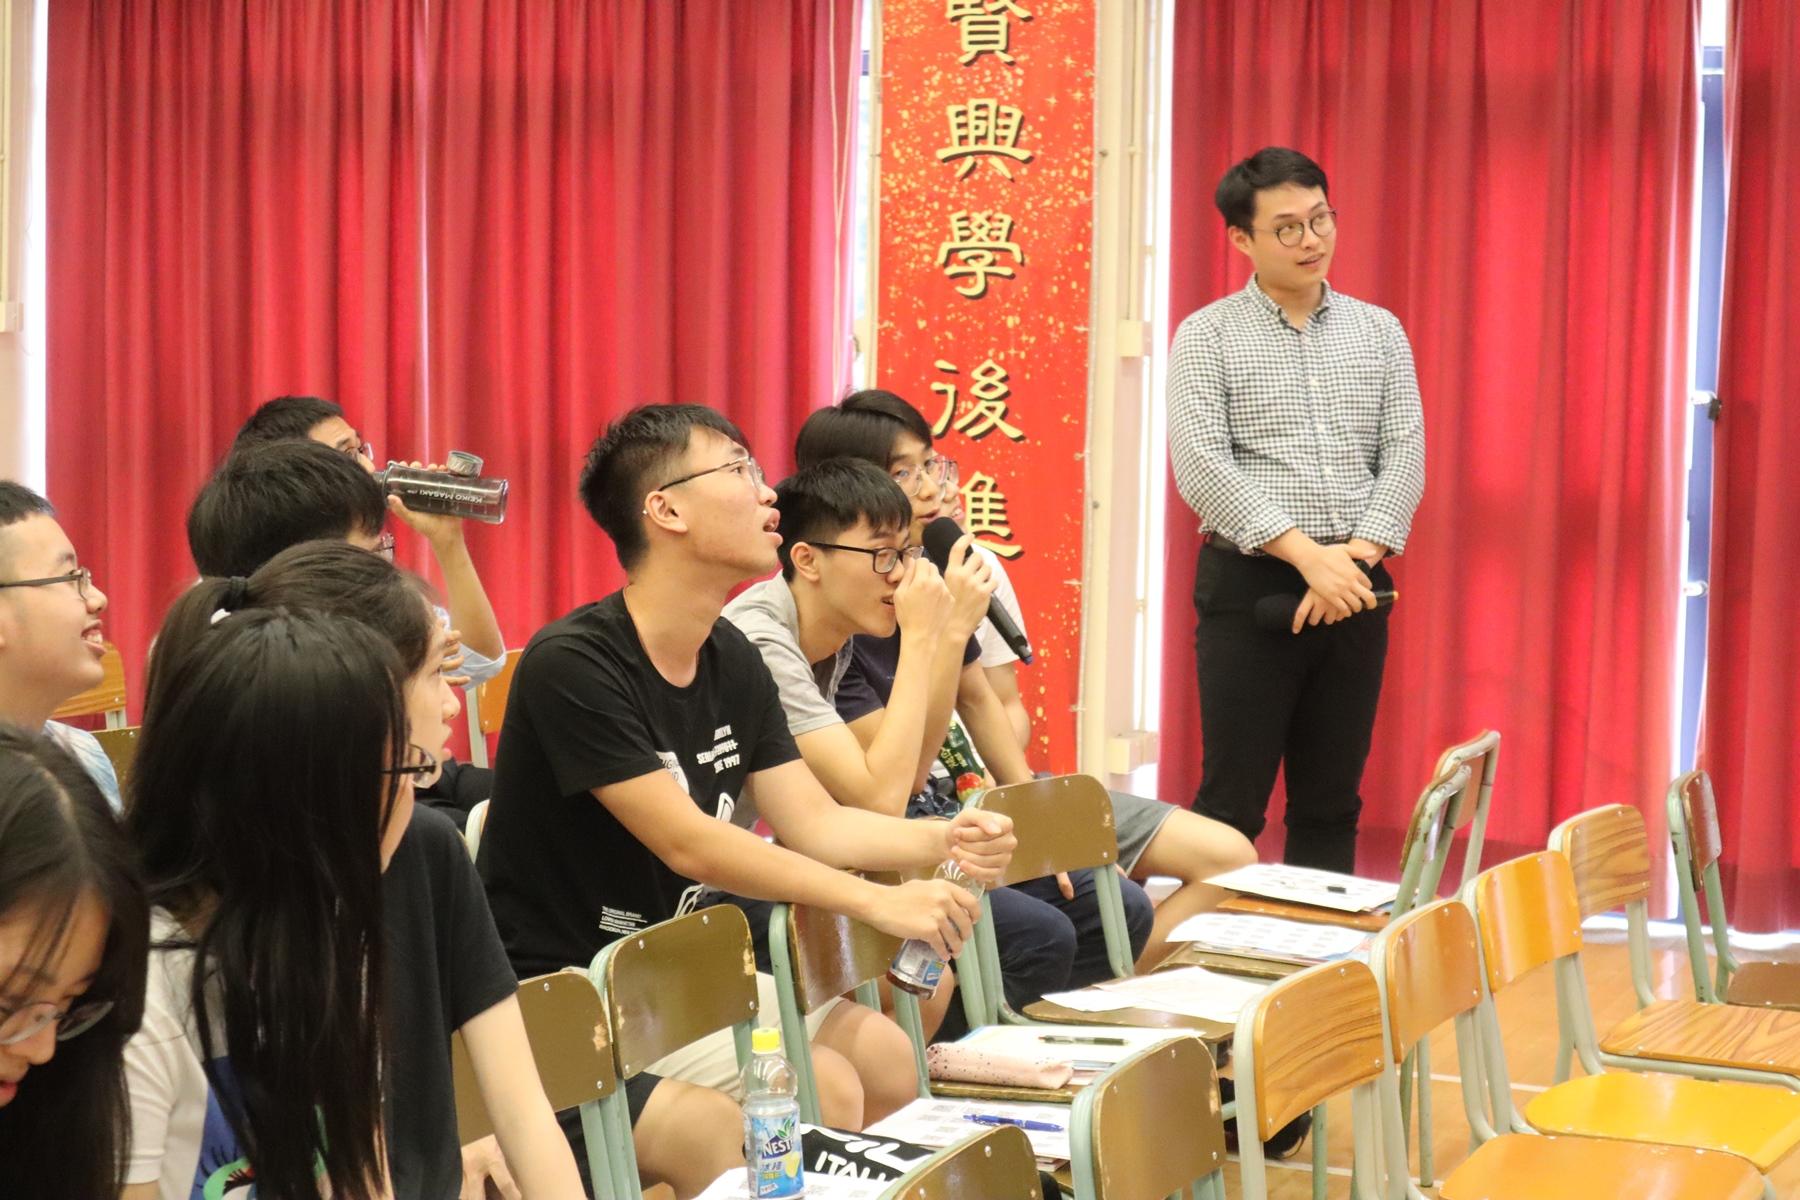 https://npc.edu.hk/sites/default/files/img_9200_2.jpg